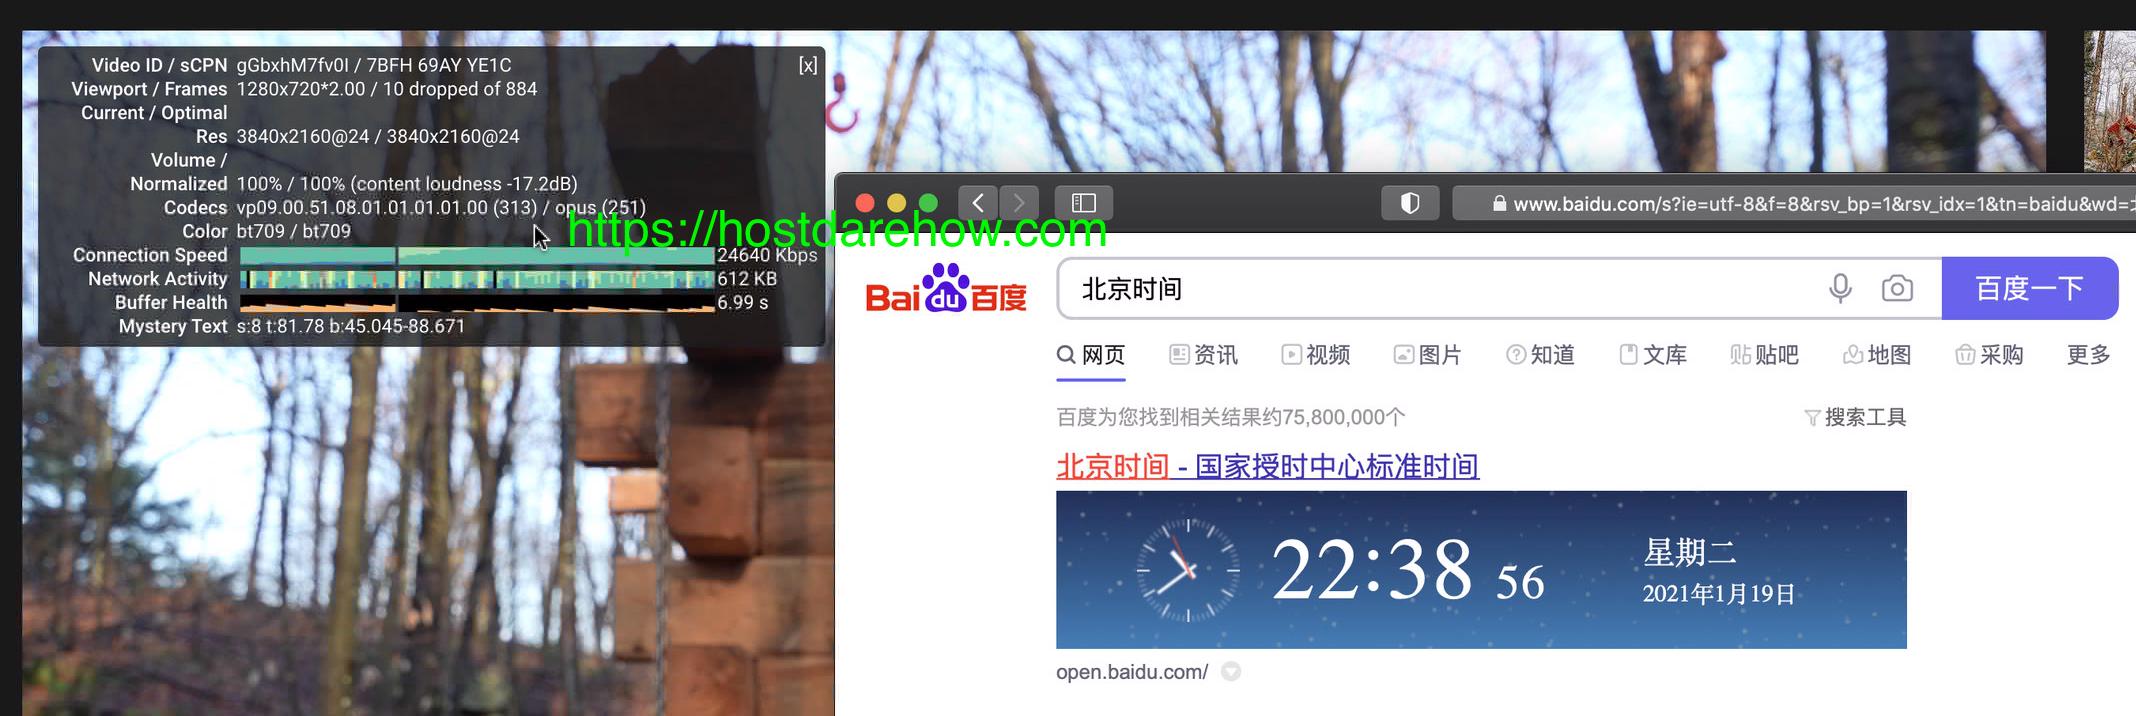 hostdare-cn2-gia-youtube-test